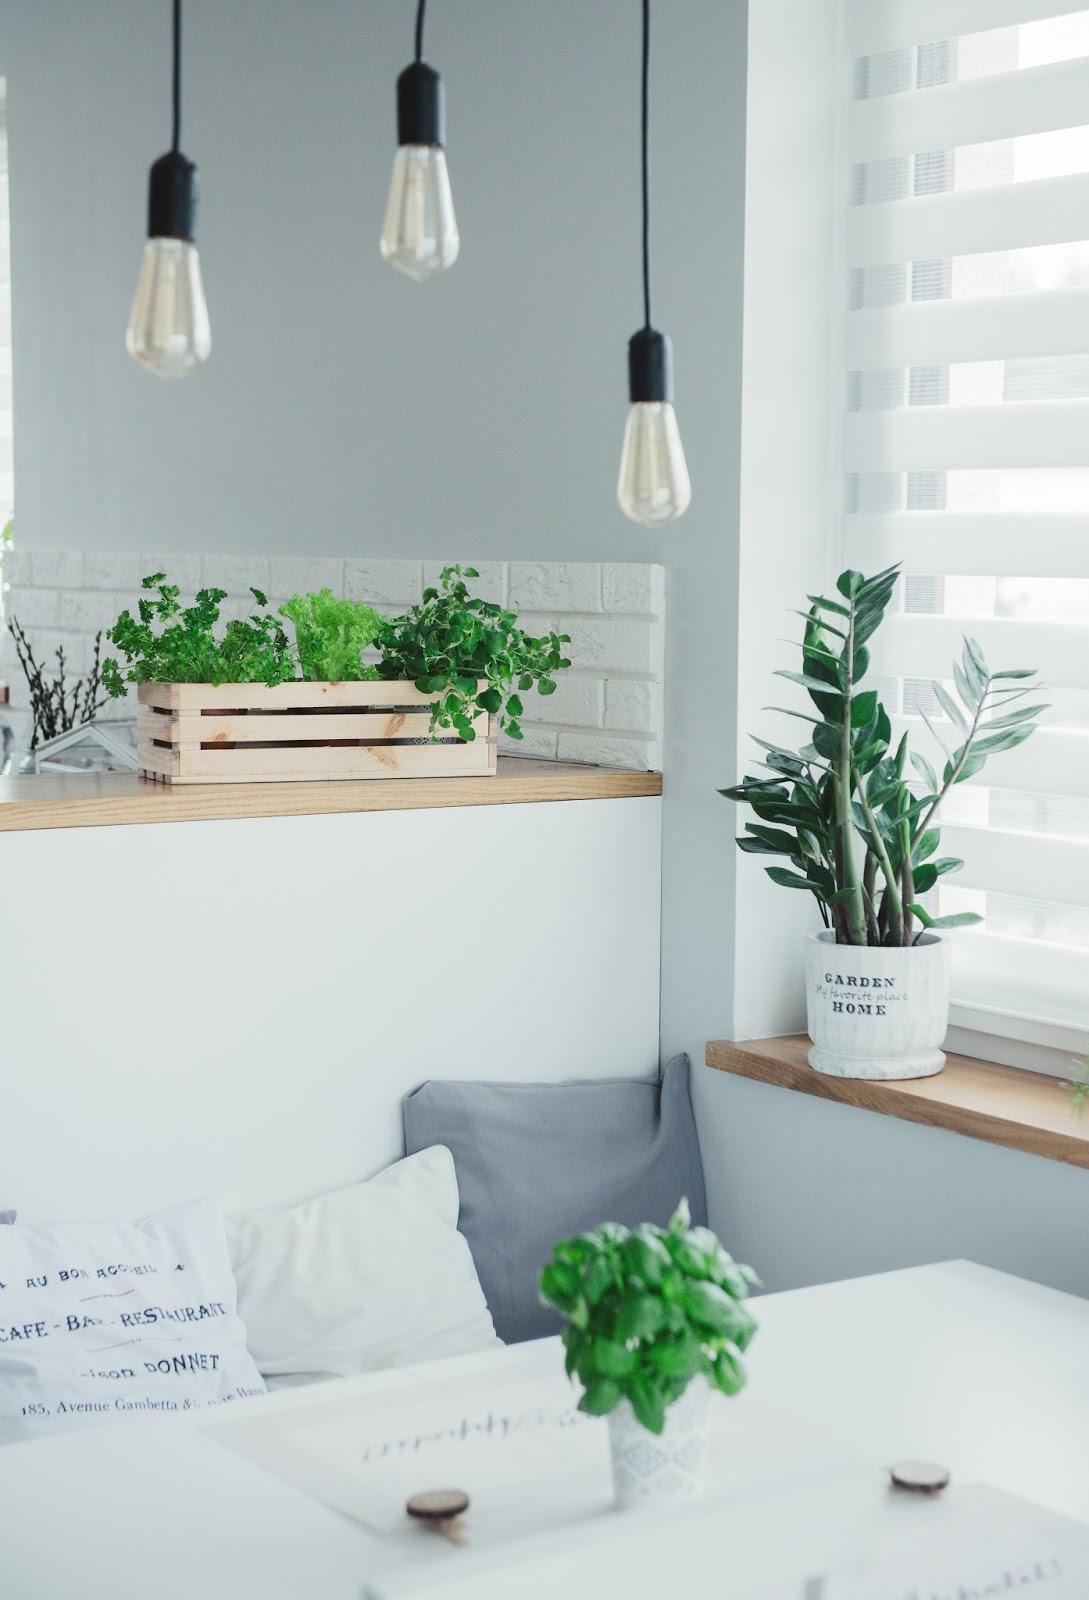 LAMPA W STYLU LOFT DO SALONU /DIY